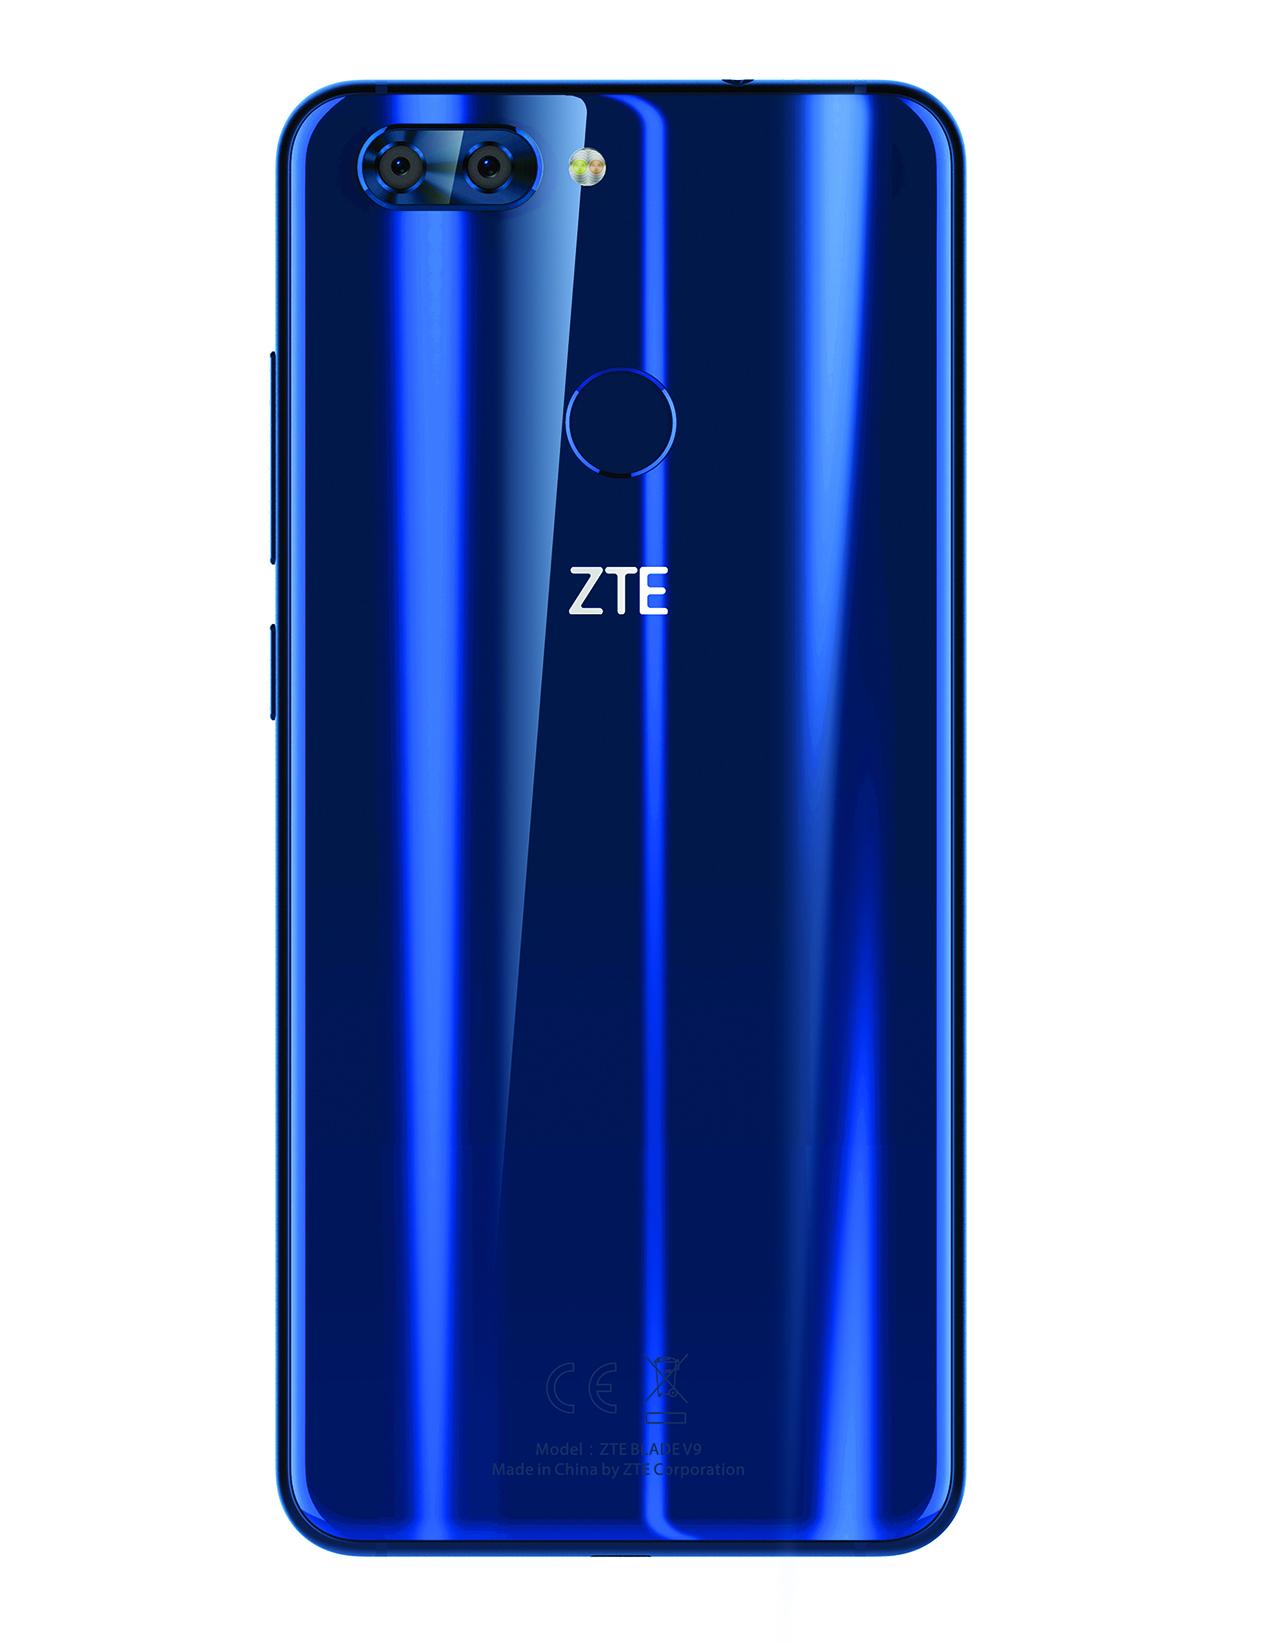 ZTE Blade V9 posterior